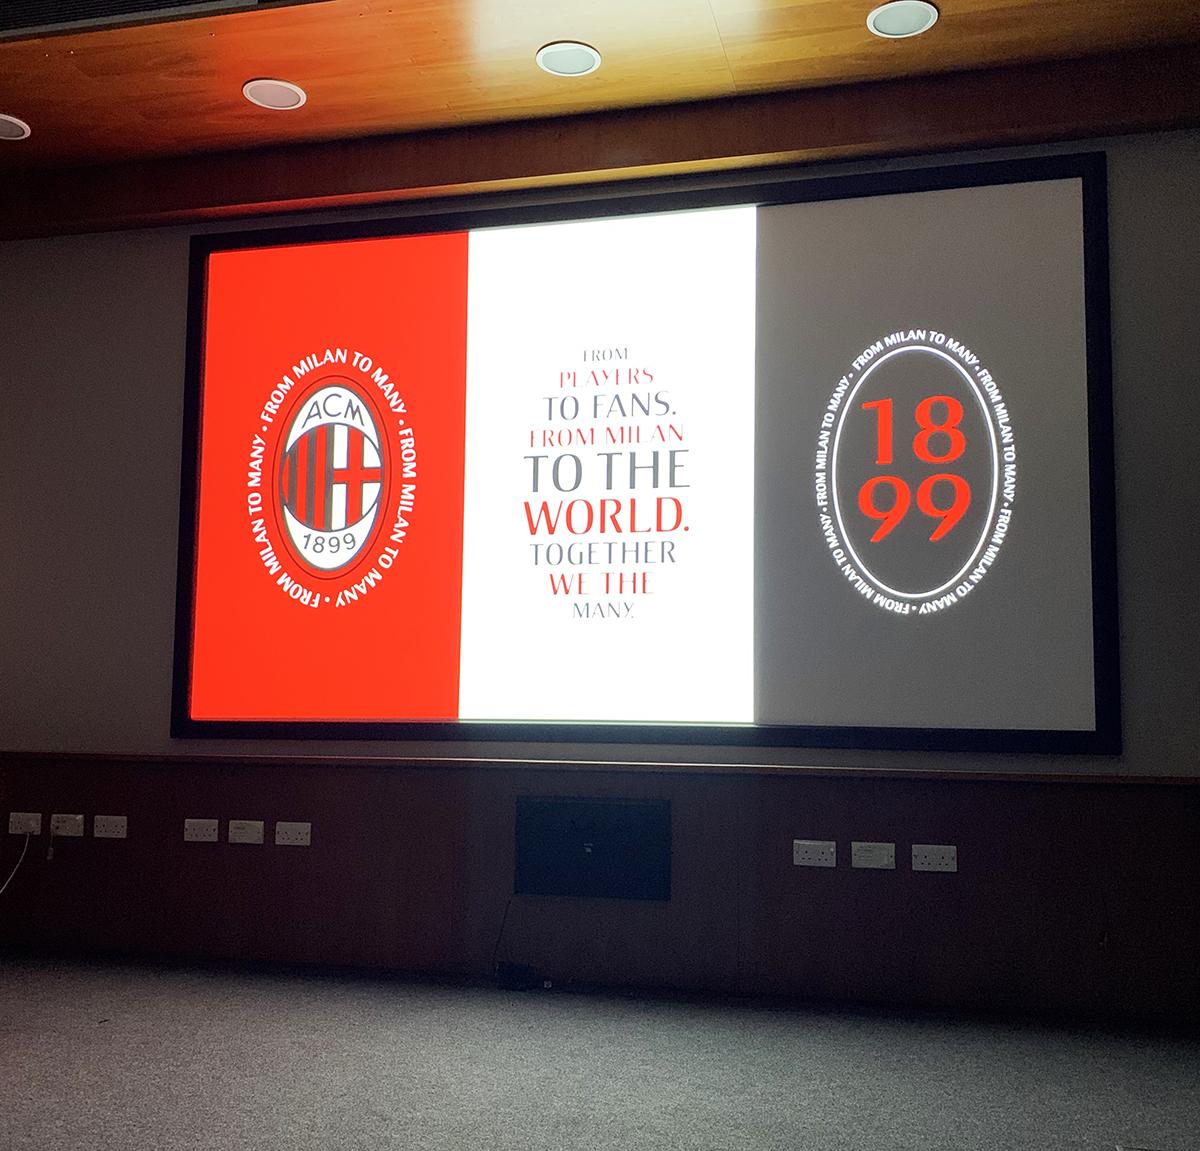 Altogether visit York Design talk from Dixon Baxi about AC Milan branding